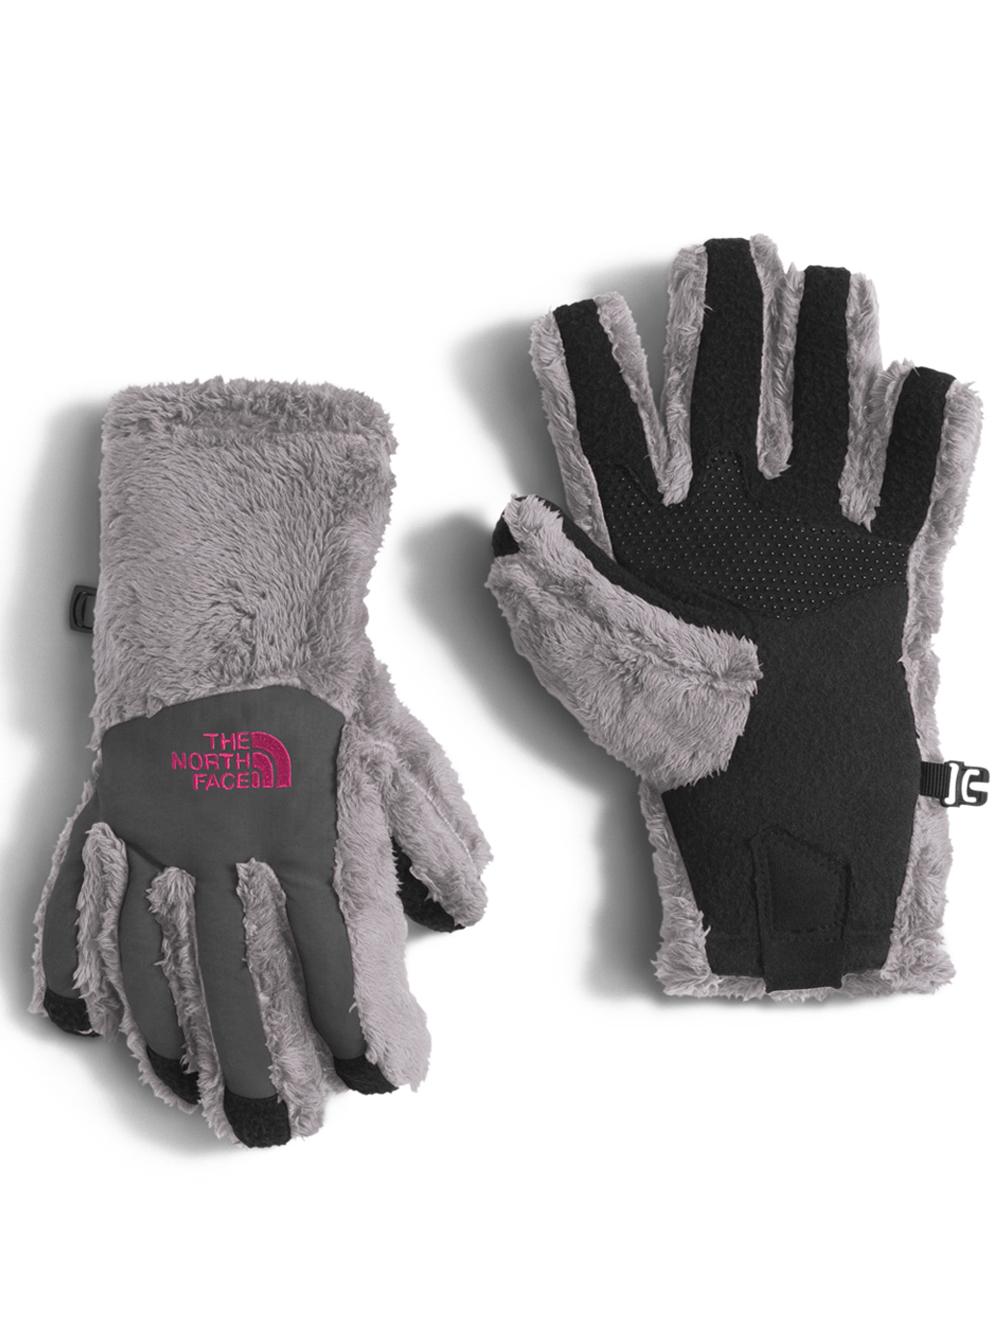 The North Face Girls' Denali Thermal Etip Glove (Sizes S - L) - metallic silver, m